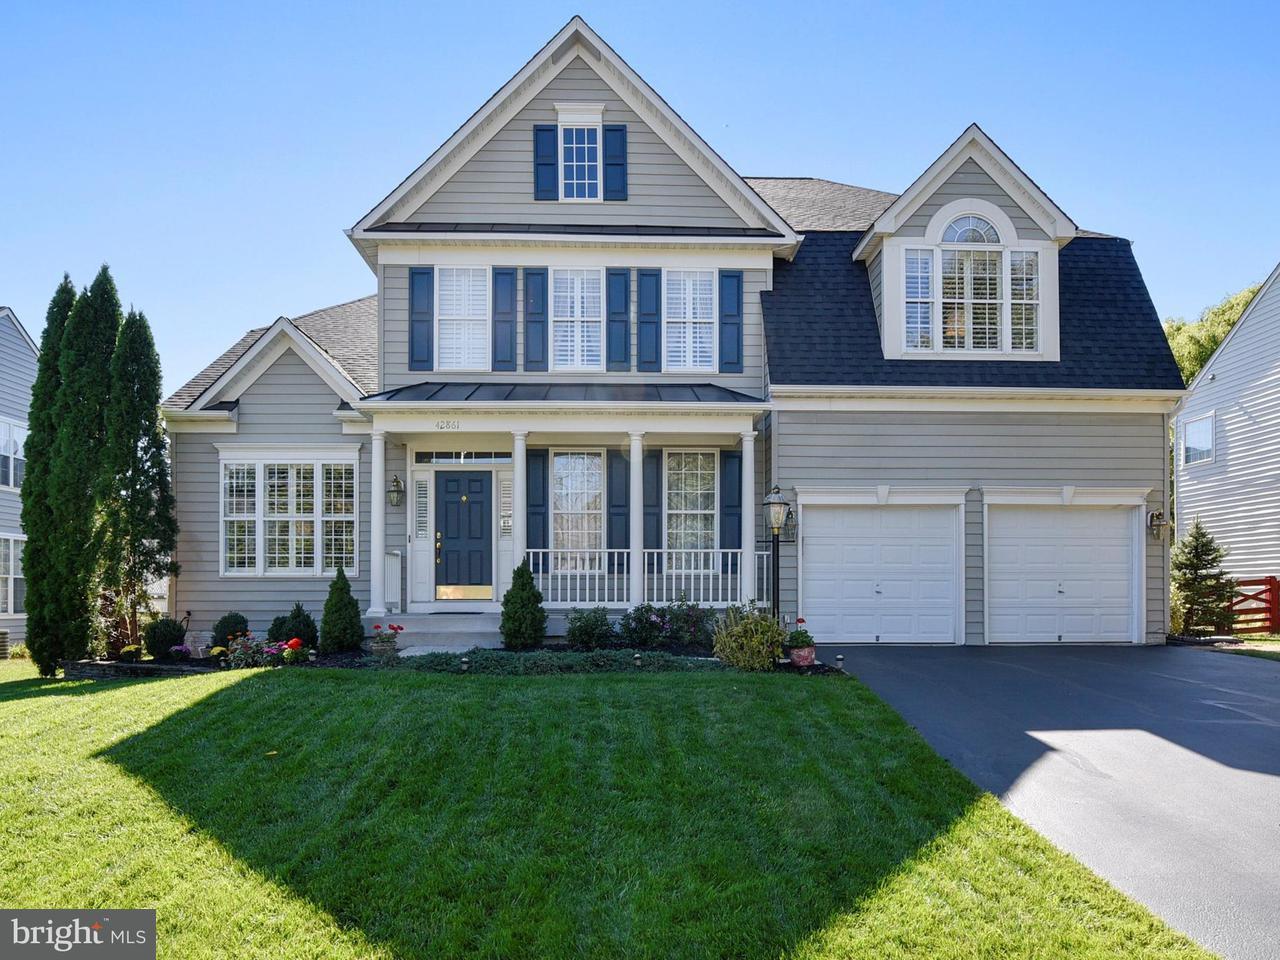 Single Family Home for Sale at 42861 Vestals Gap Drive 42861 Vestals Gap Drive Broadlands, Virginia 20148 United States